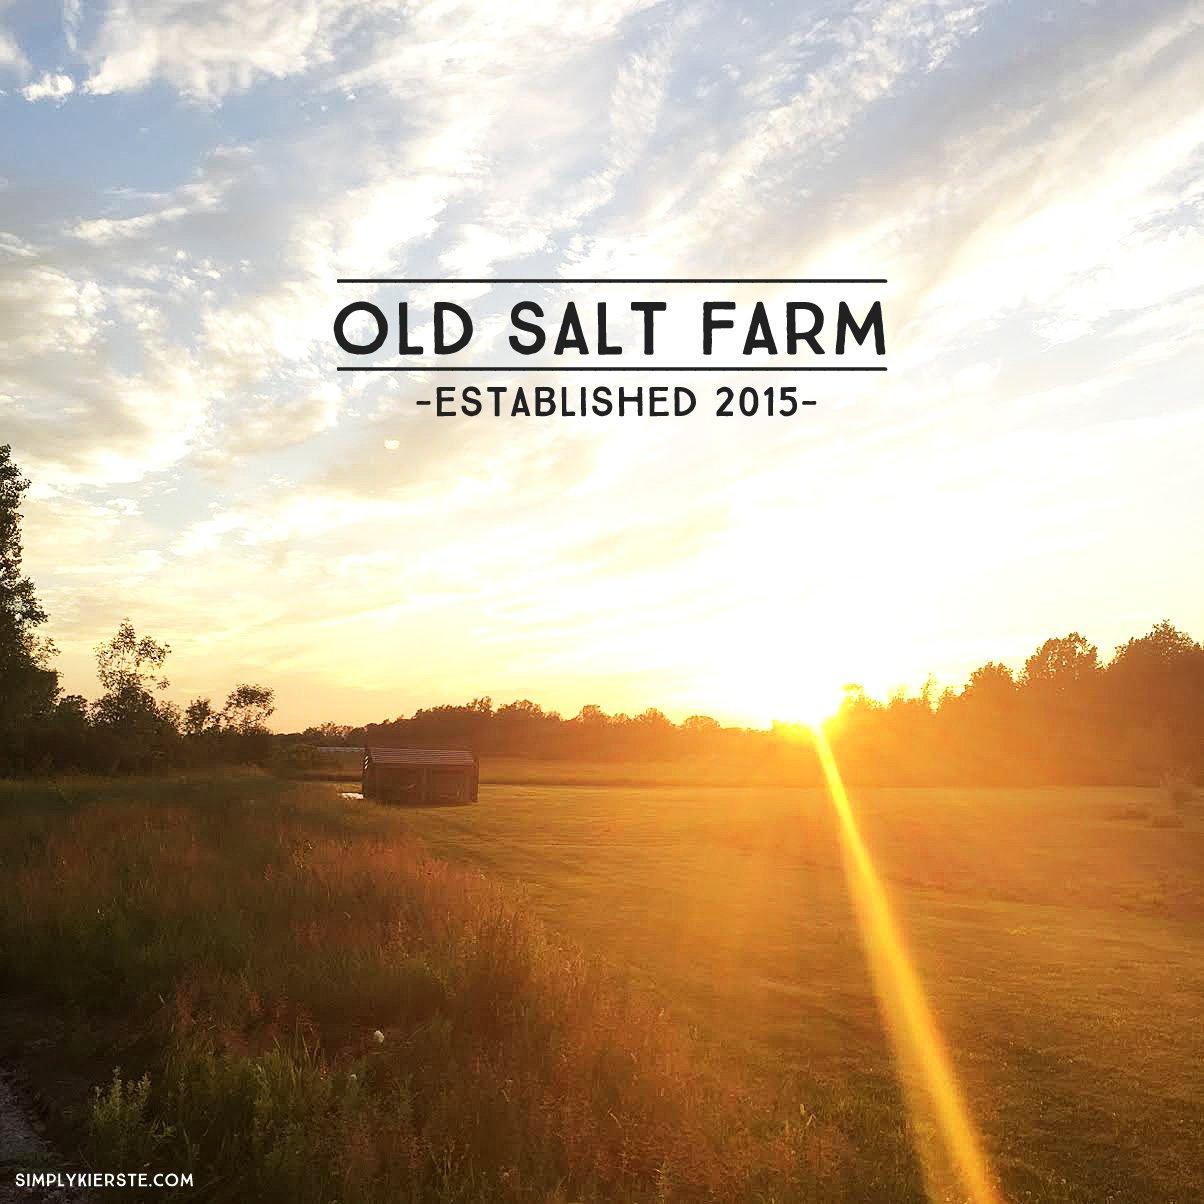 Building Old Salt Farm